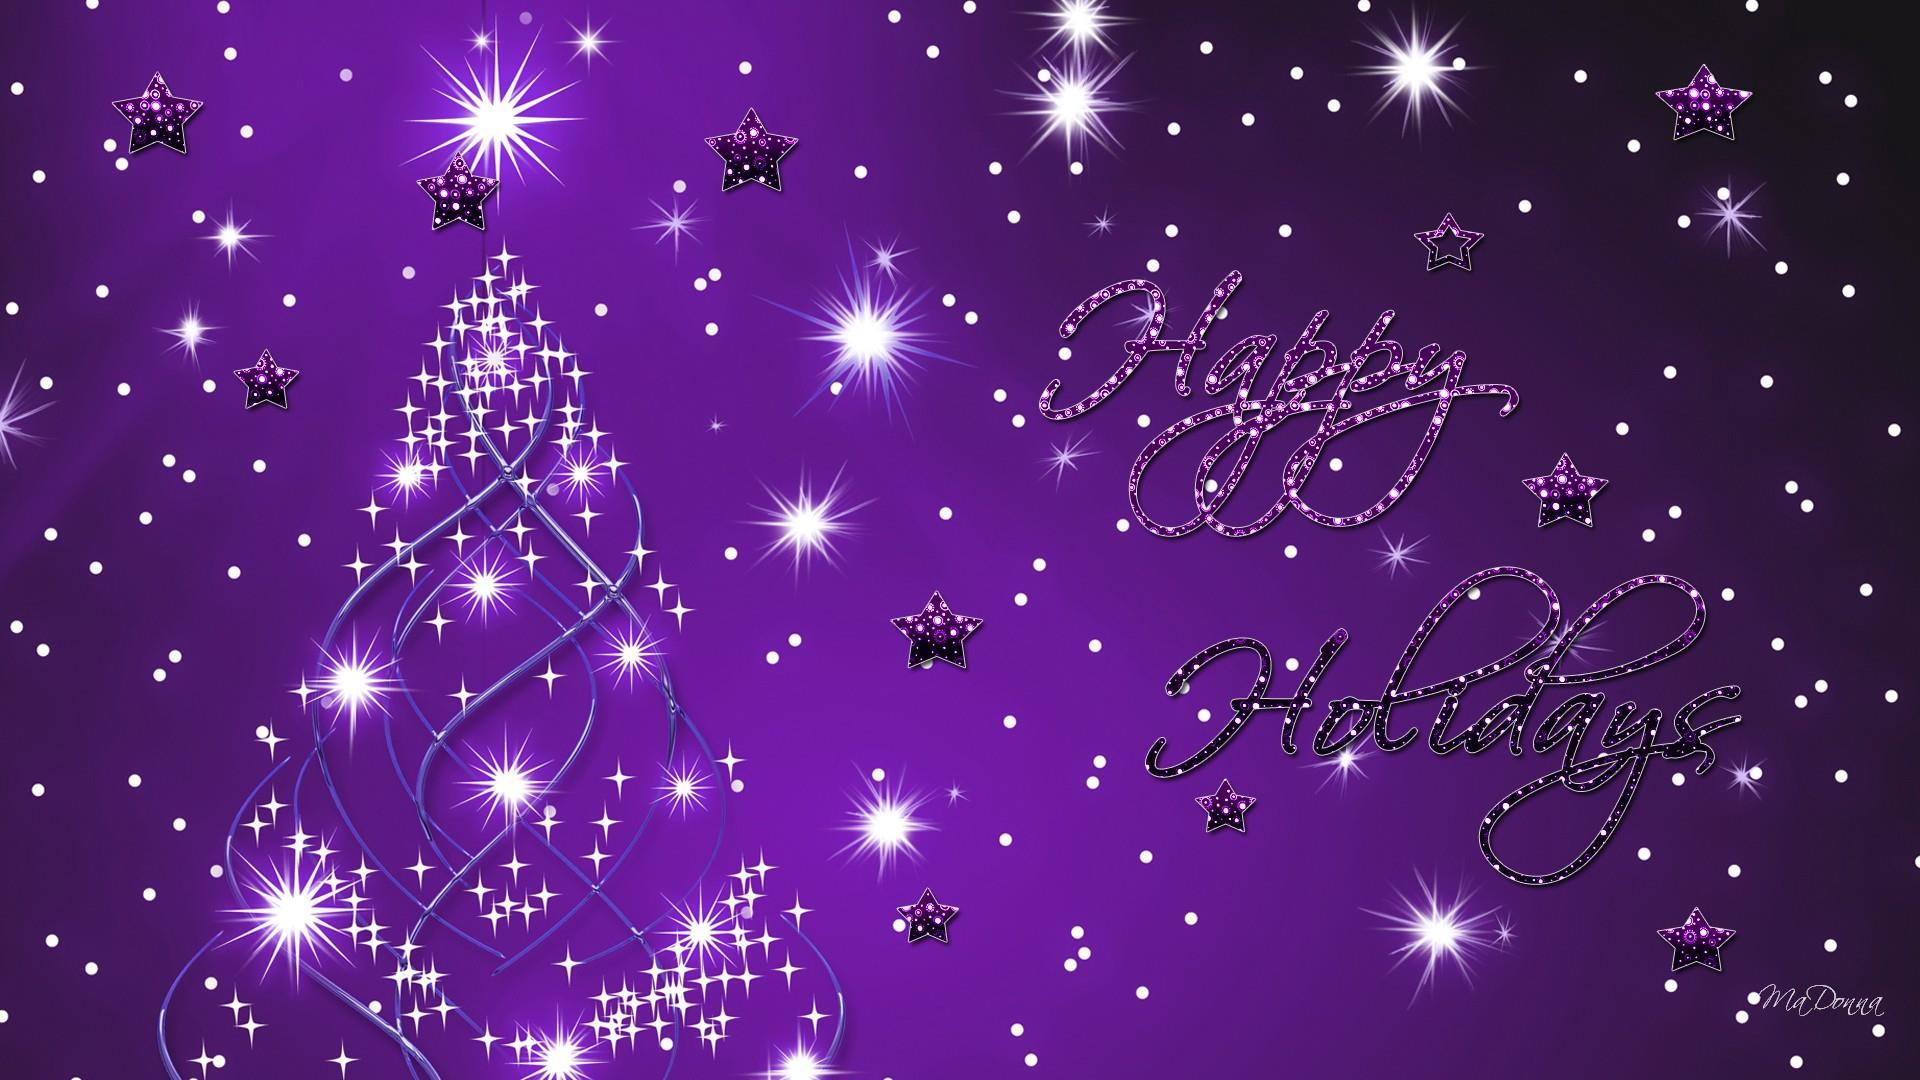 christmas-wallpaper-purple-97840880-1920x1080